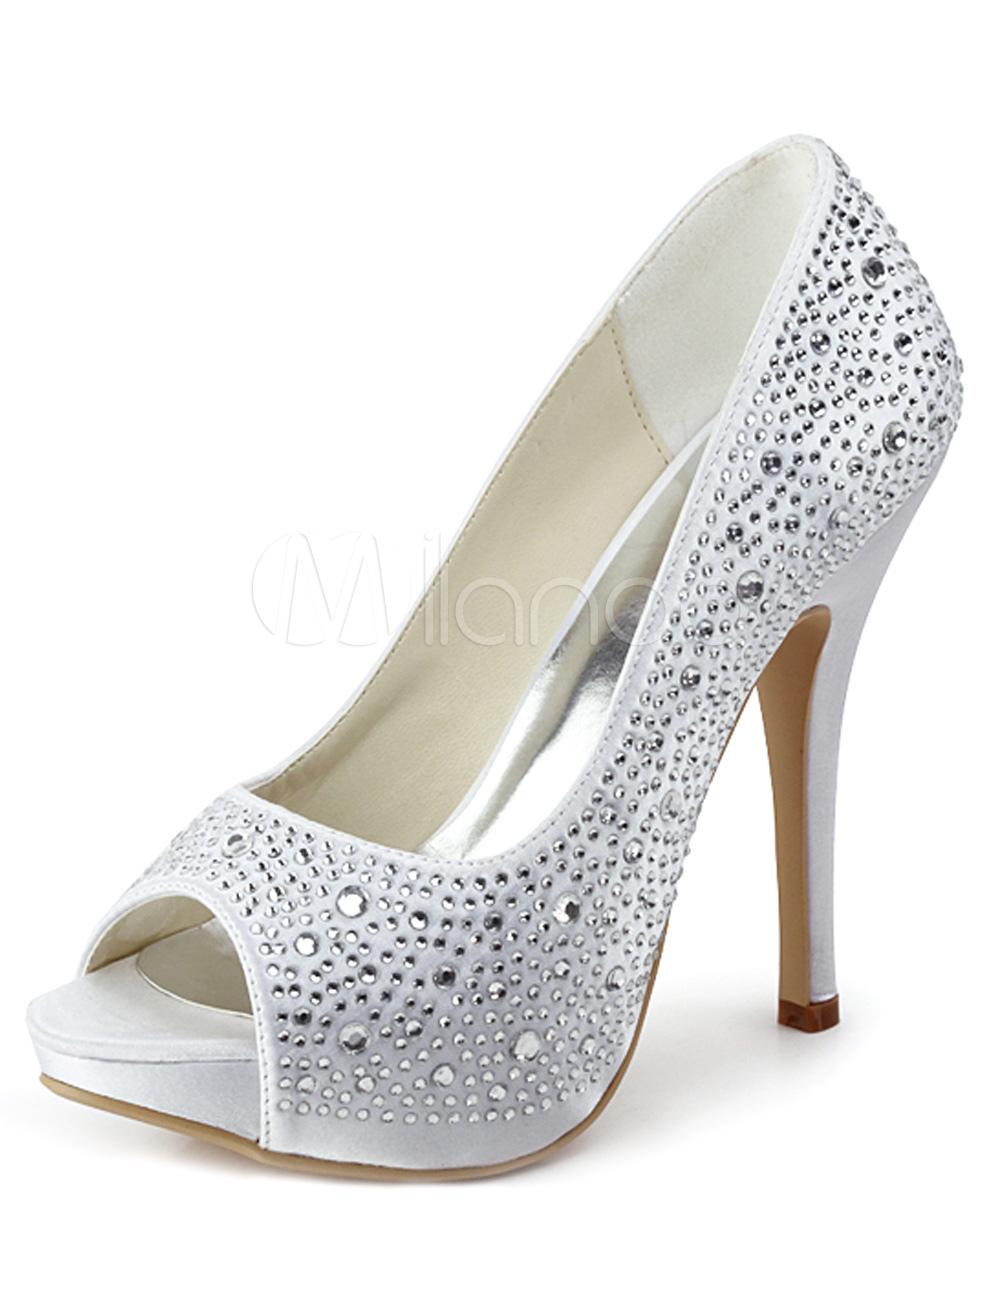 Glitter Elegant Silk And Satin Rhinestone Peep Toe High Heels